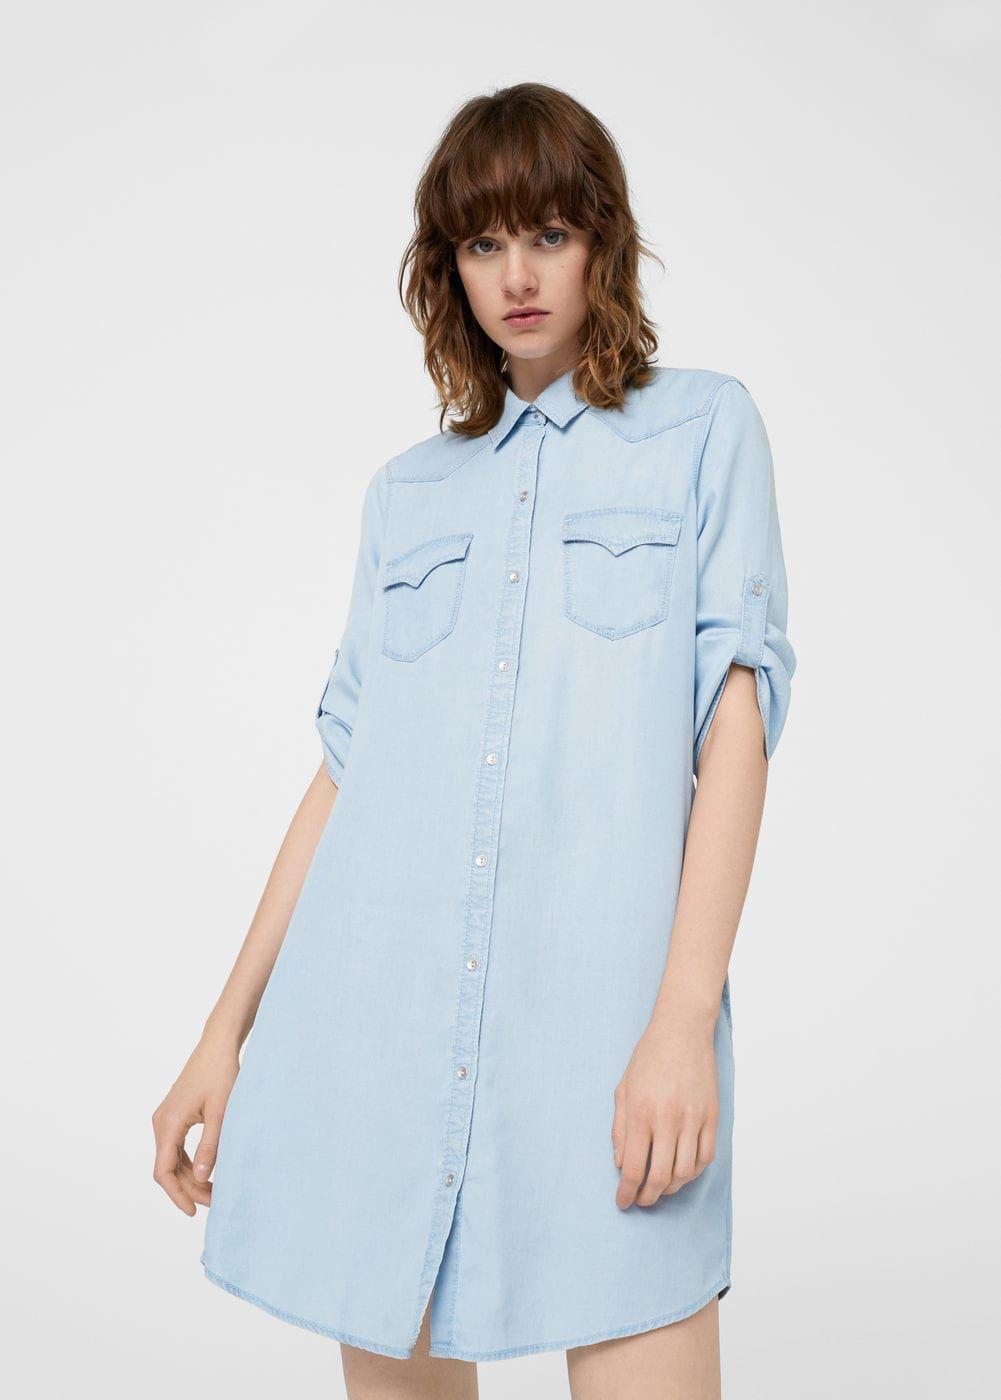 456305b3a3bc59 Denim shirt dress - Women   Mango   Denim shirt dress, Dresses ...